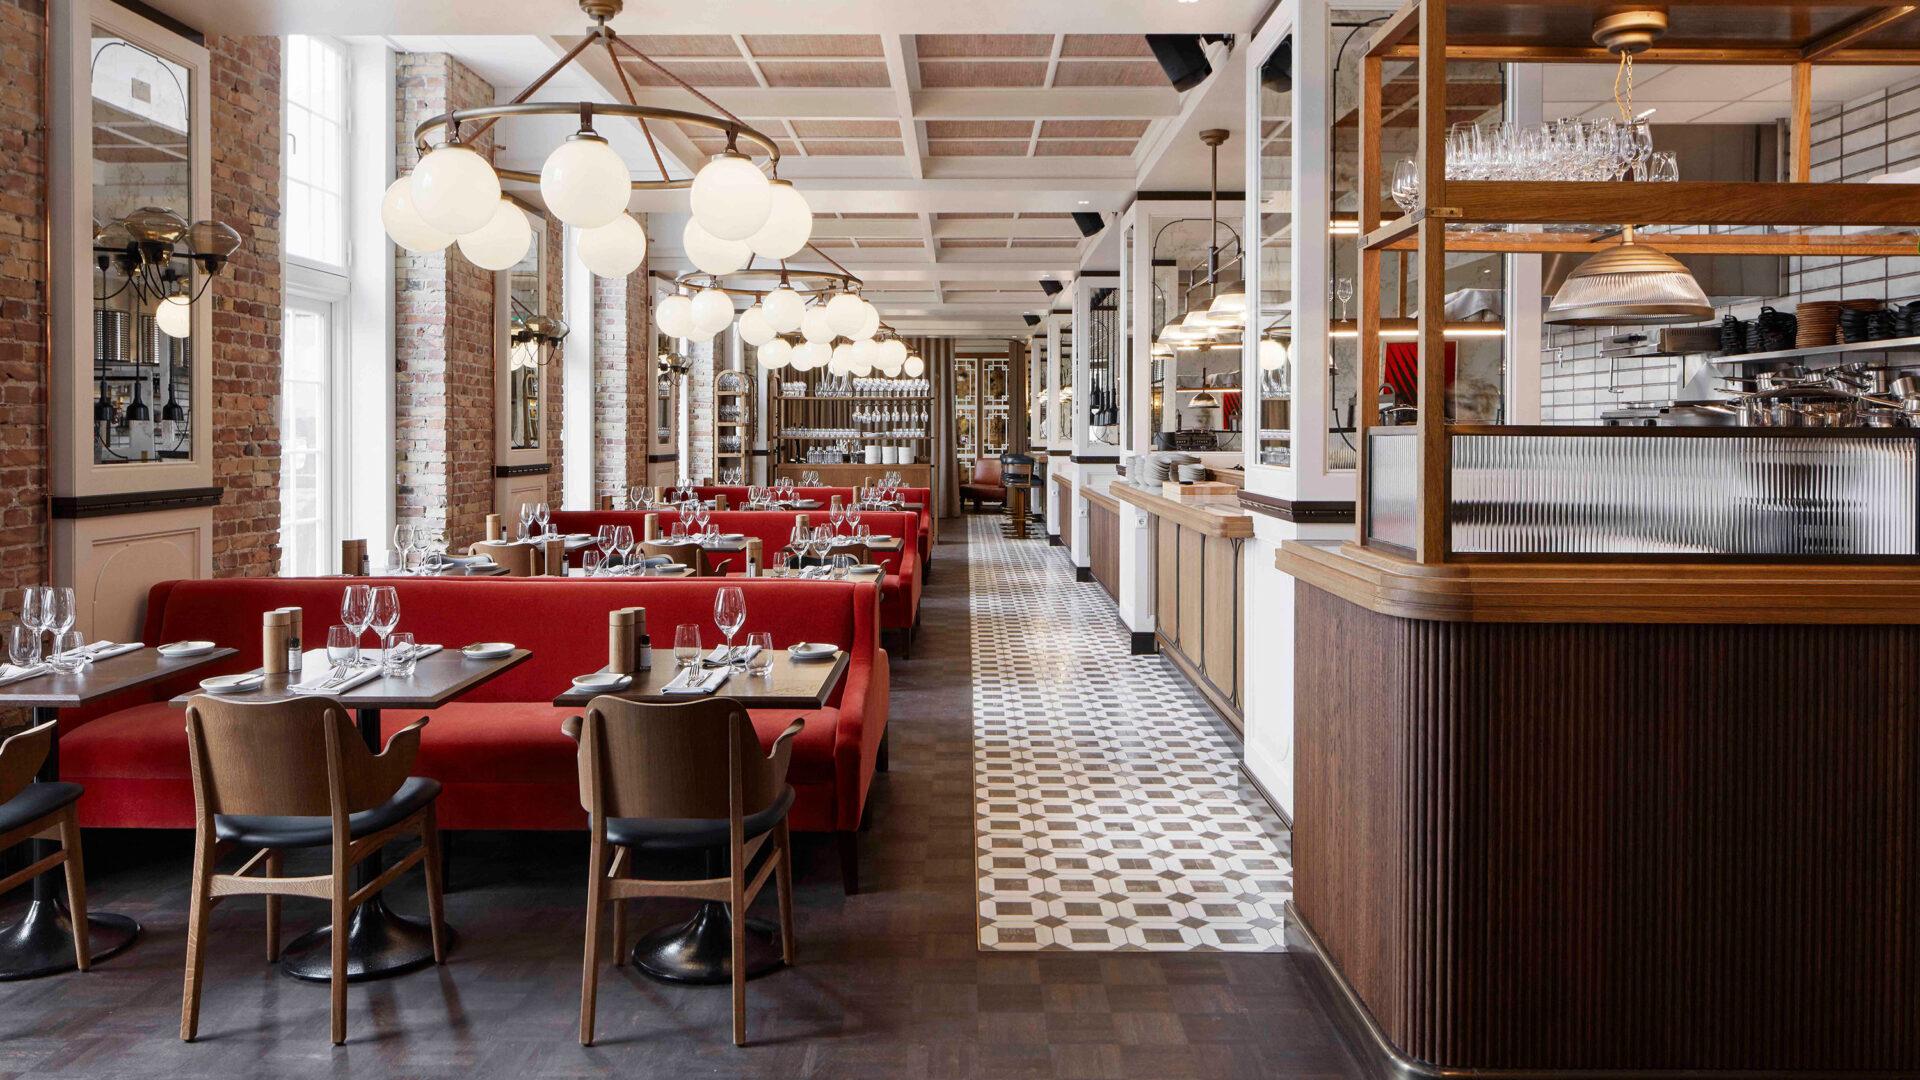 Villa Copenhagen. Hotel, który promuje idee świadomego luksusu